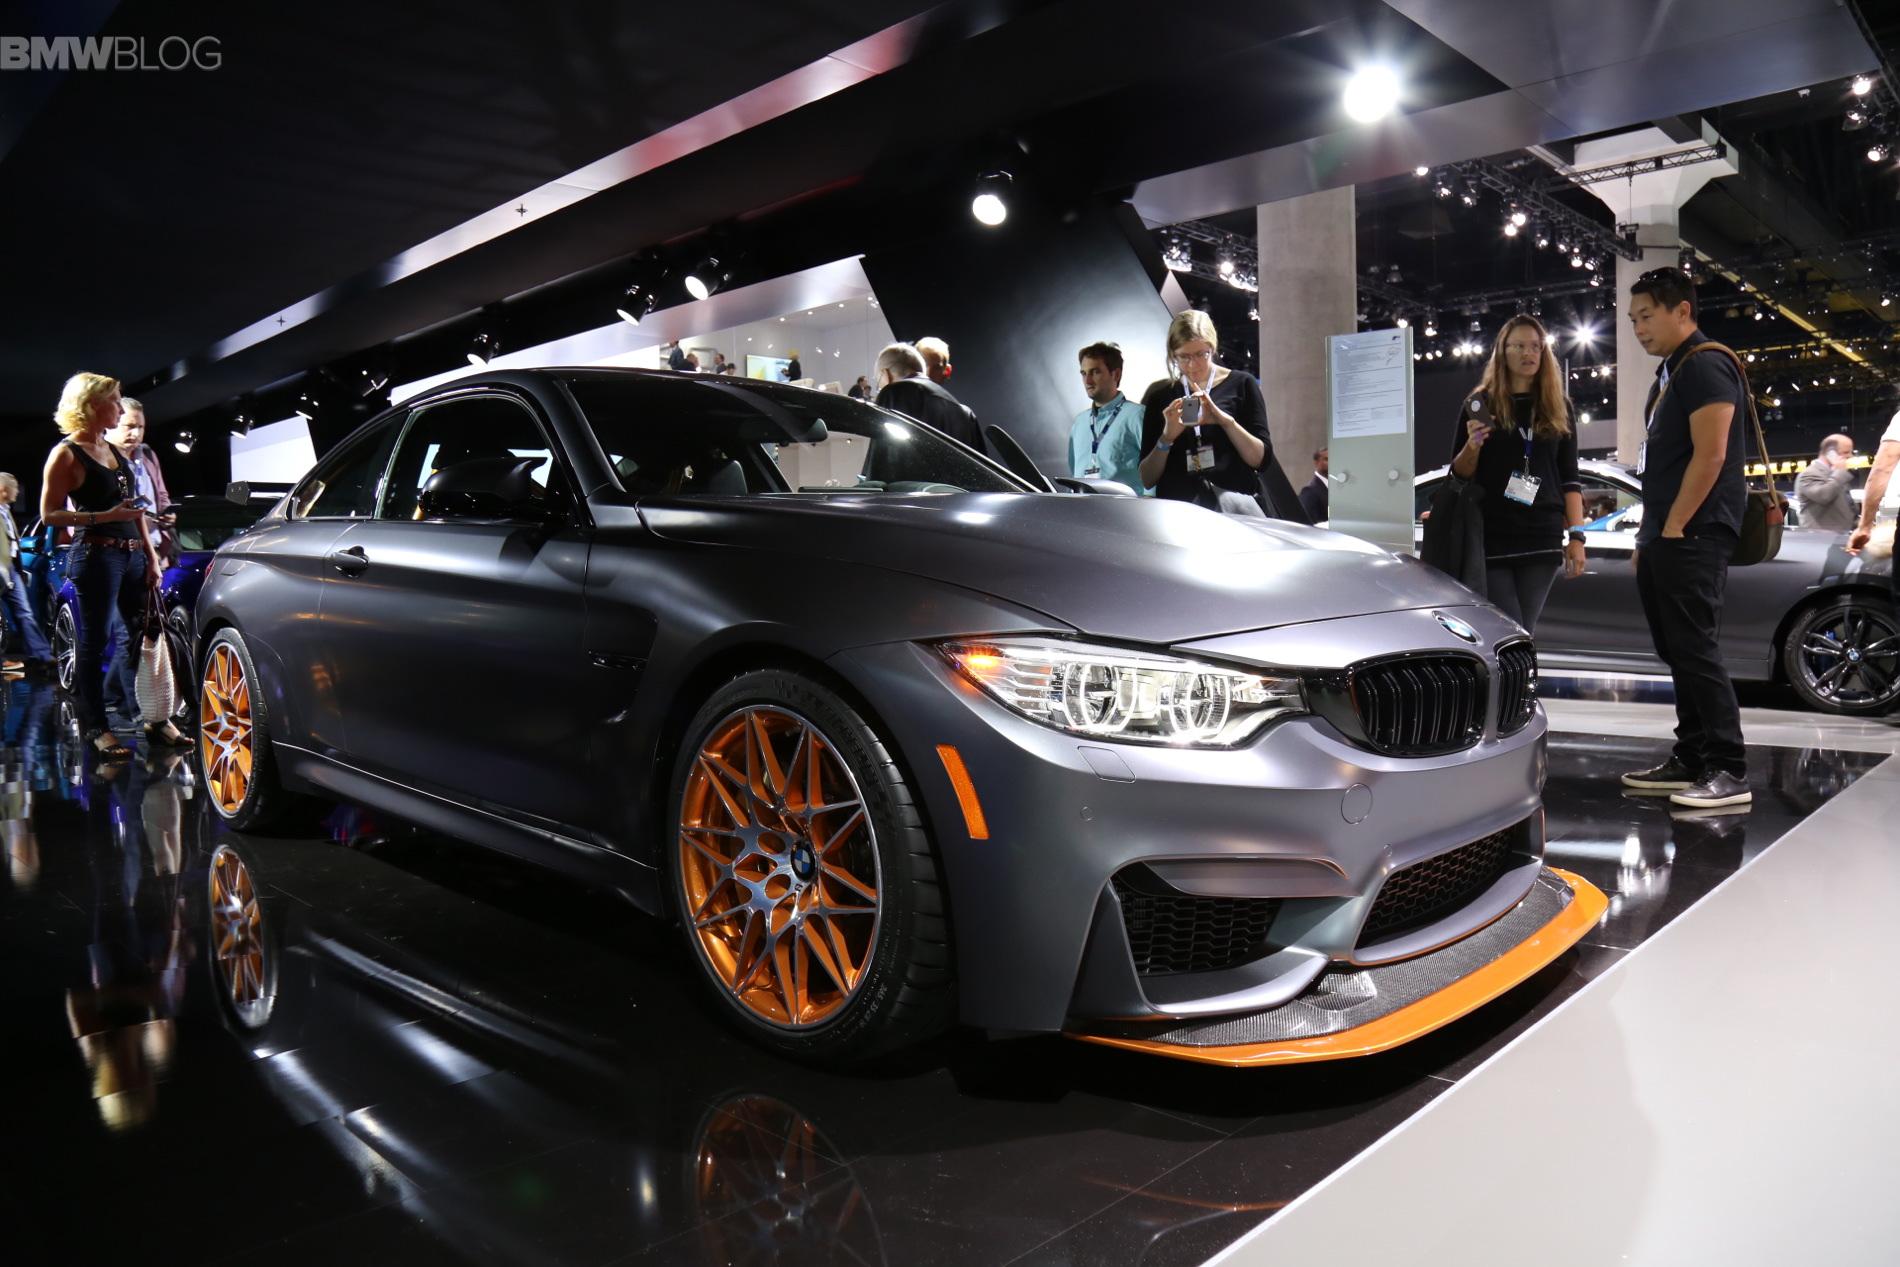 2015 La Auto Show Bmw M4 Gts Makes Its North American Debut